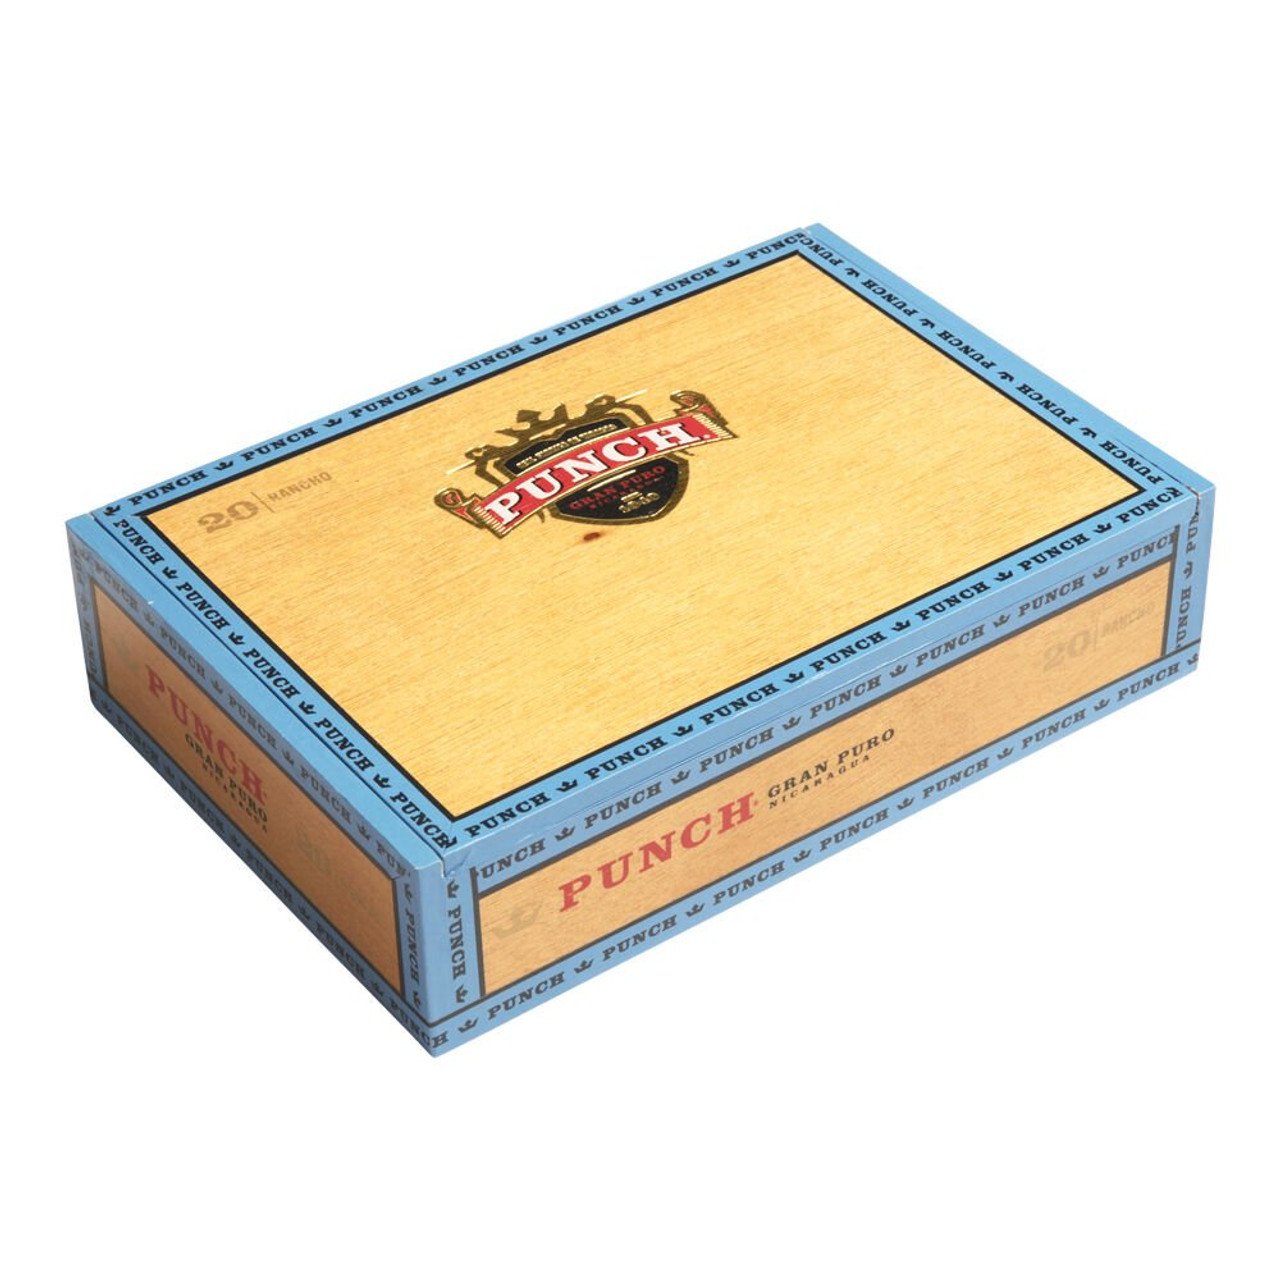 Punch Gran Puro Nicaragua Cigars - 6 x 54 (Box of 20)